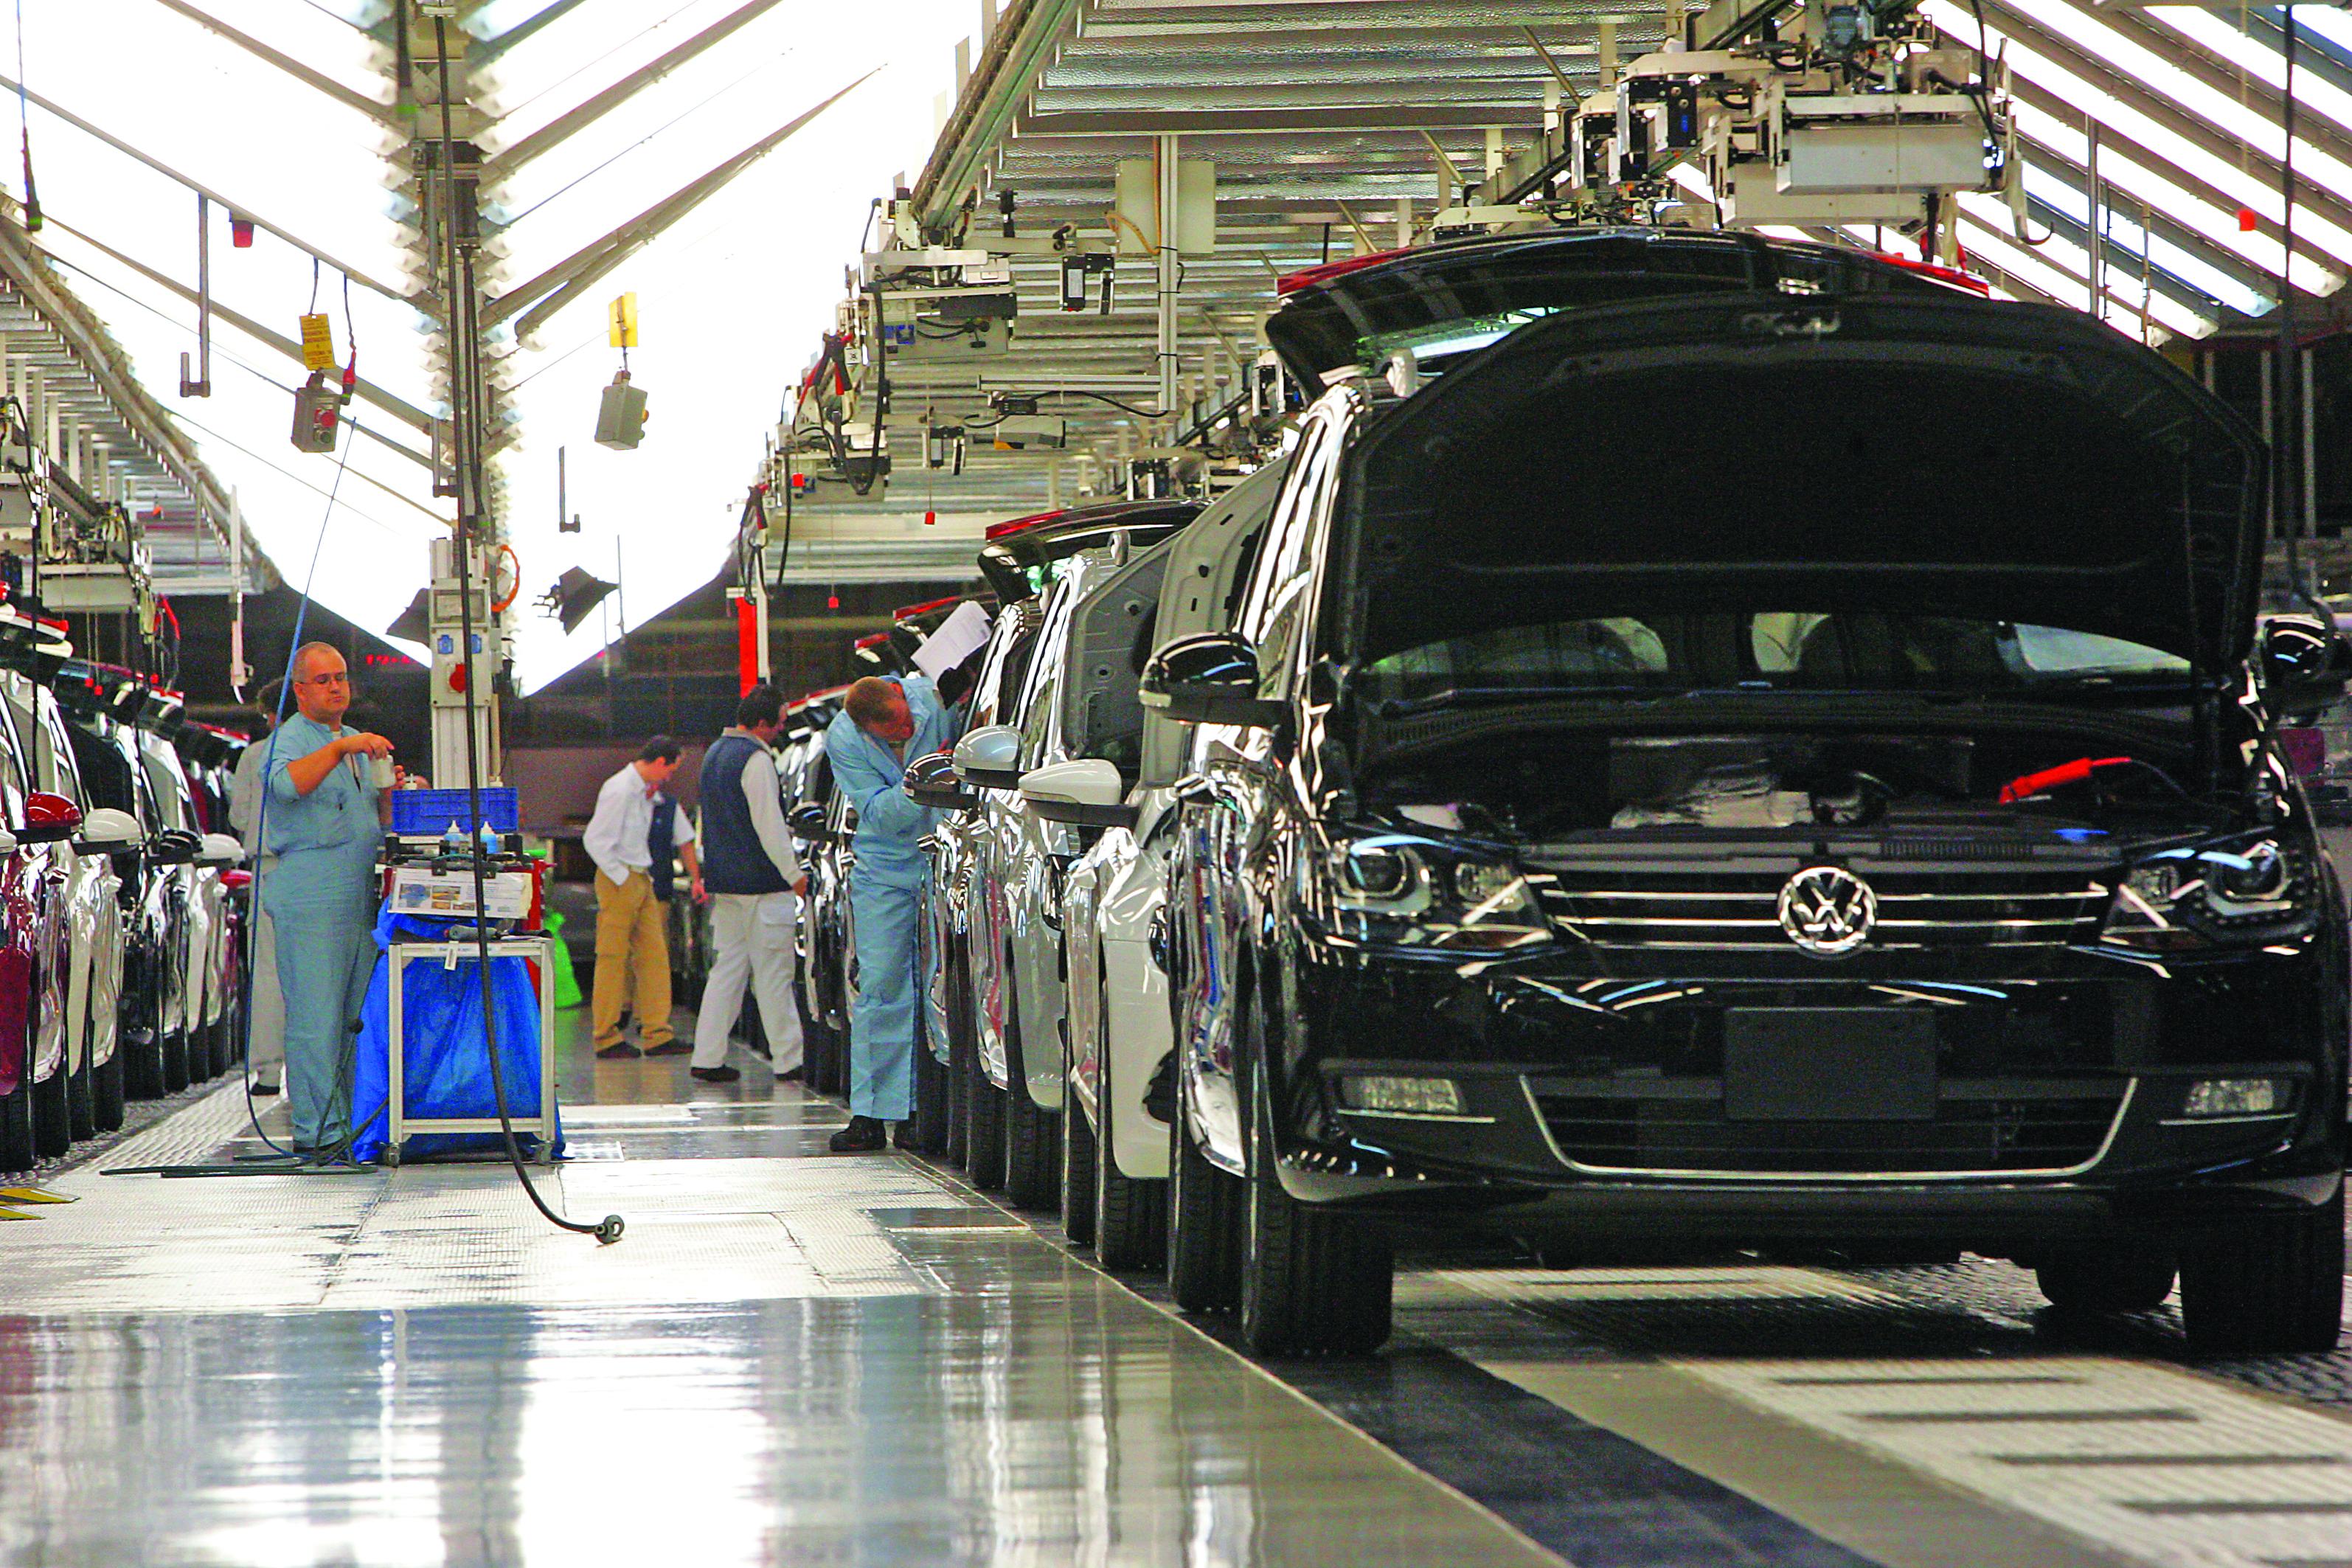 Conheça o novo SUV da Volkswagen: o T-Roc